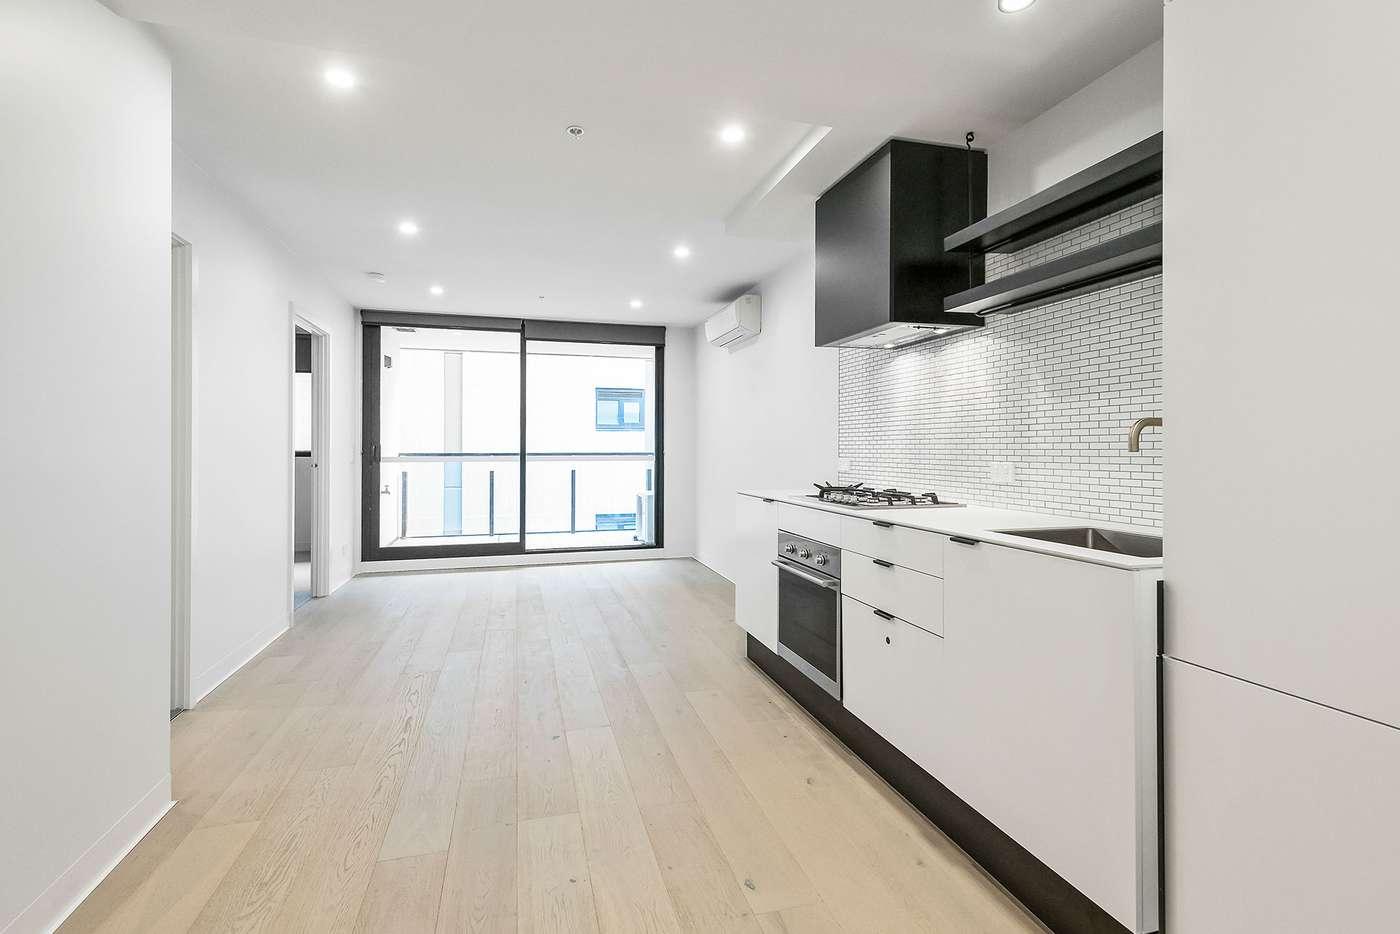 Main view of Homely apartment listing, 204/115 Church Street, Richmond VIC 3121